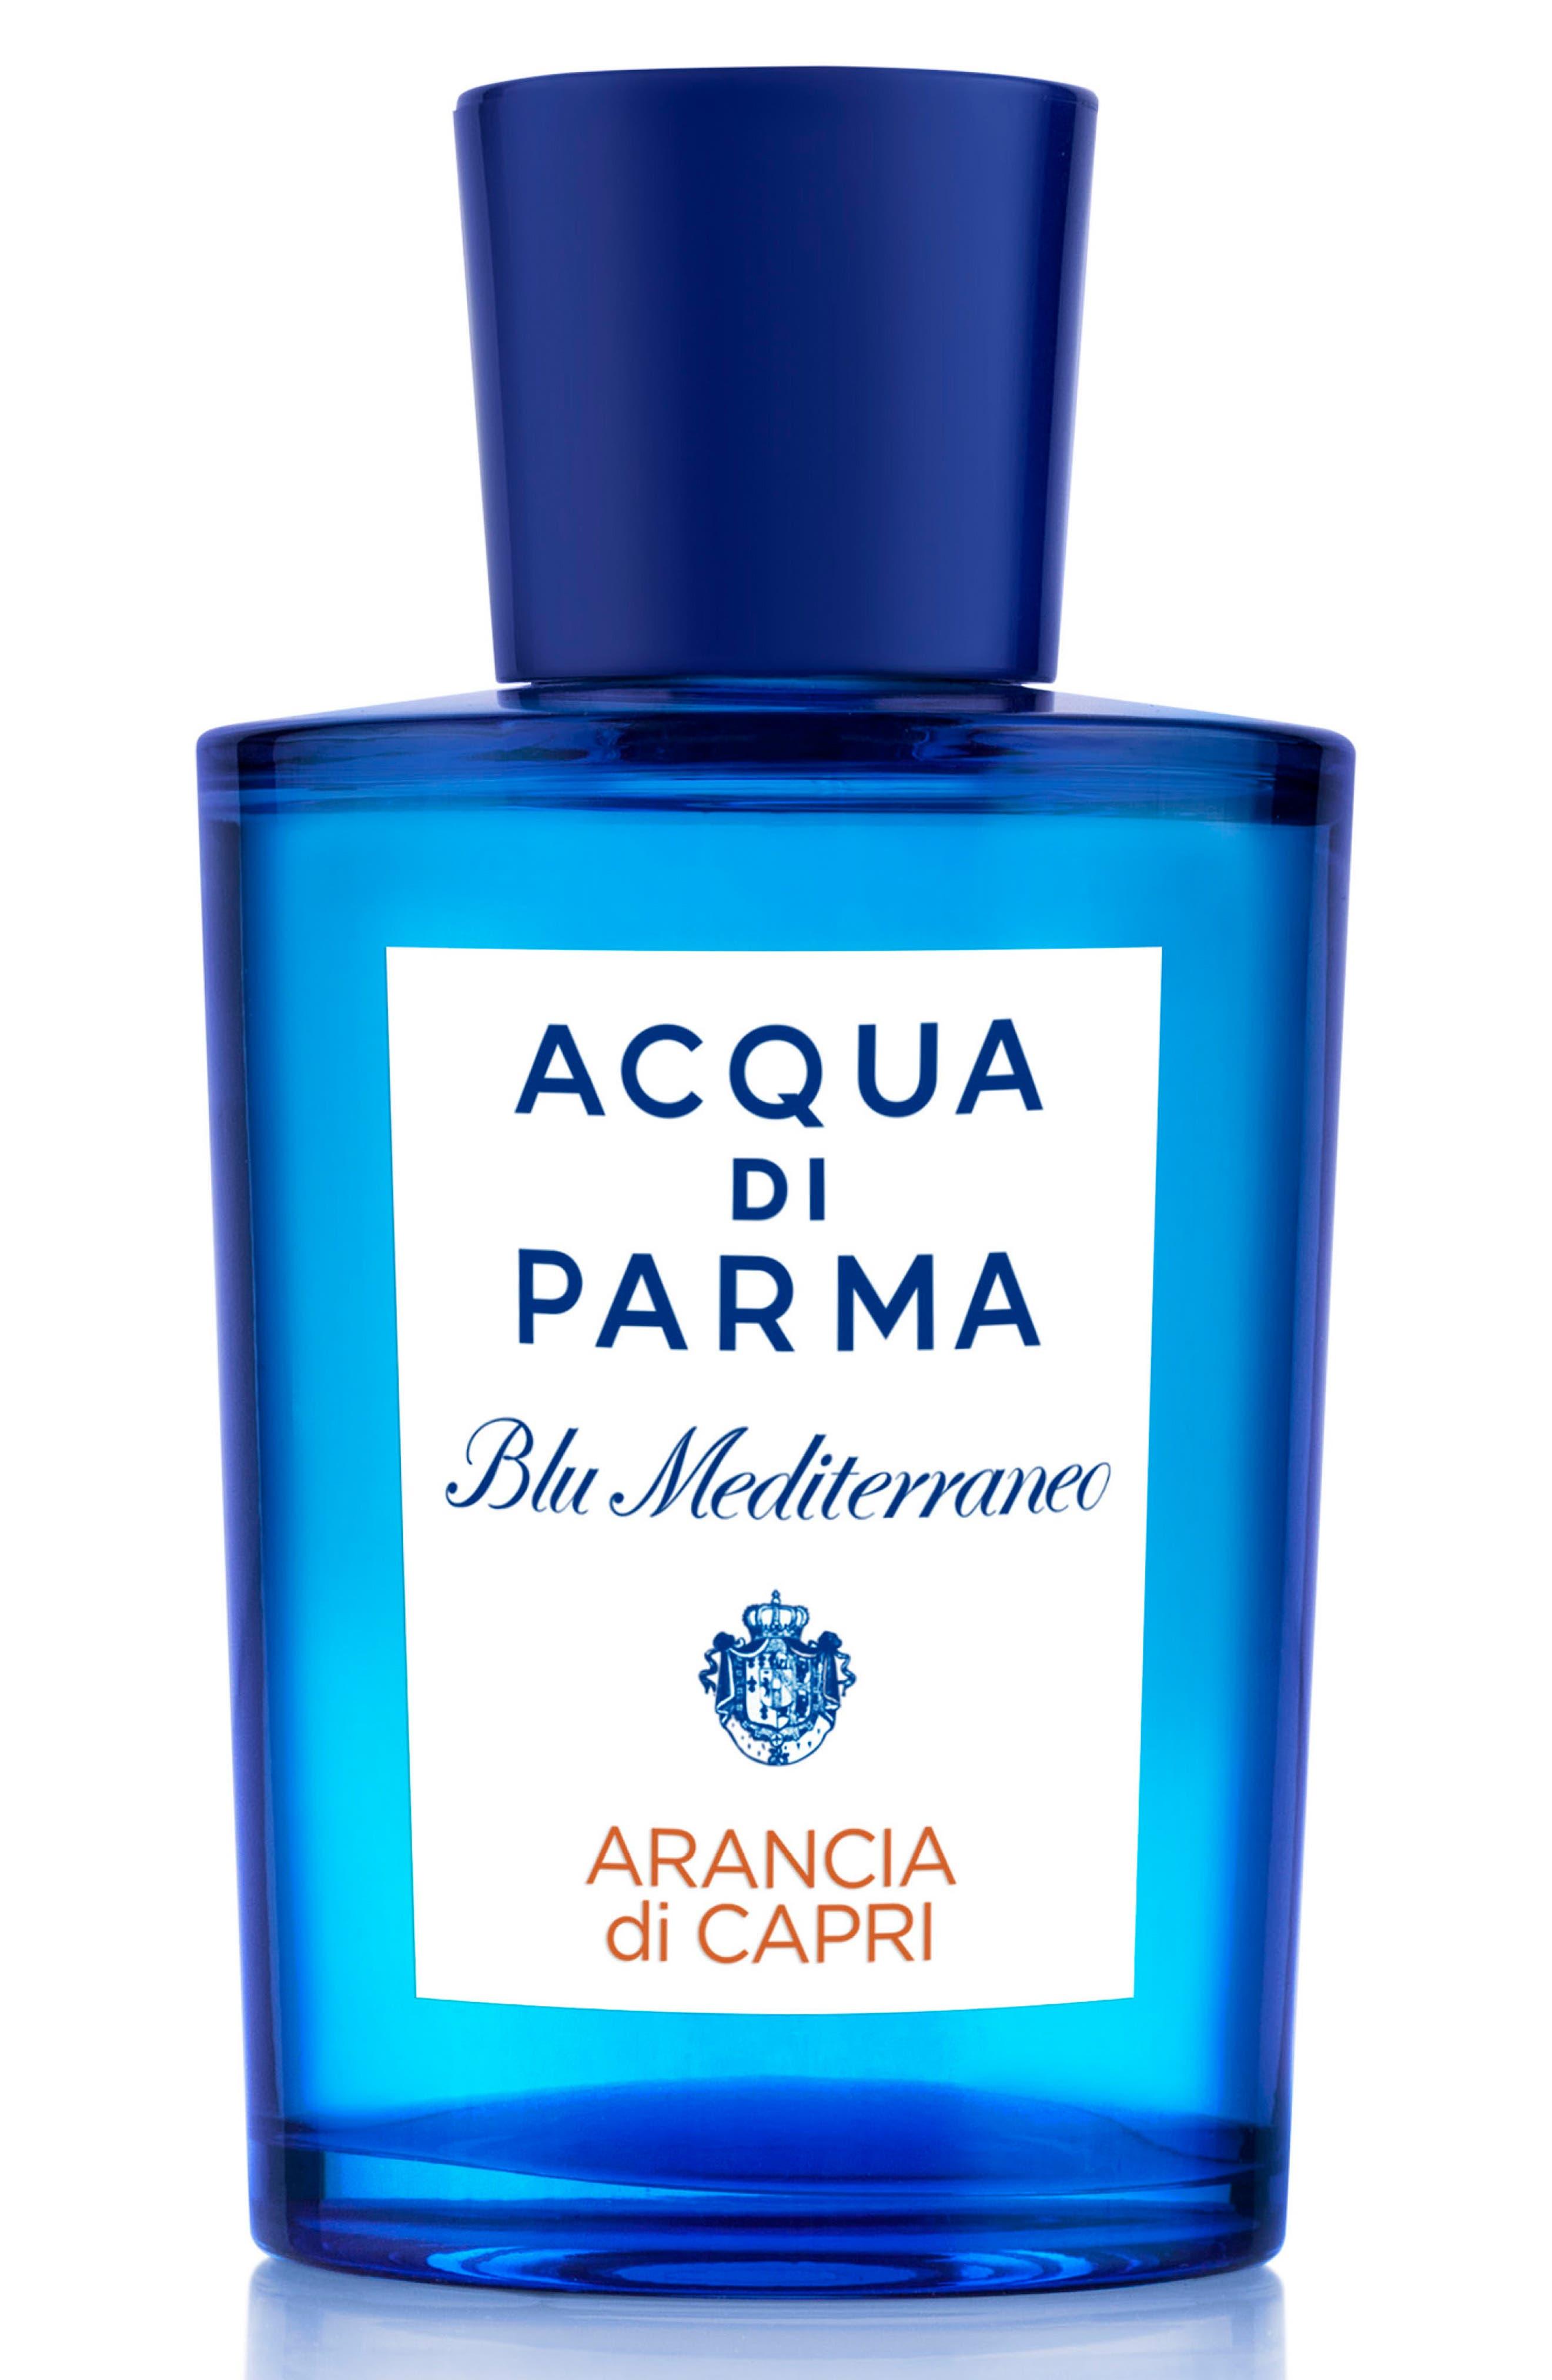 ACQUA DI PARMA, Blu Mediterraneo Arancia di Capri Eau de Toilette, Alternate thumbnail 4, color, NO COLOR